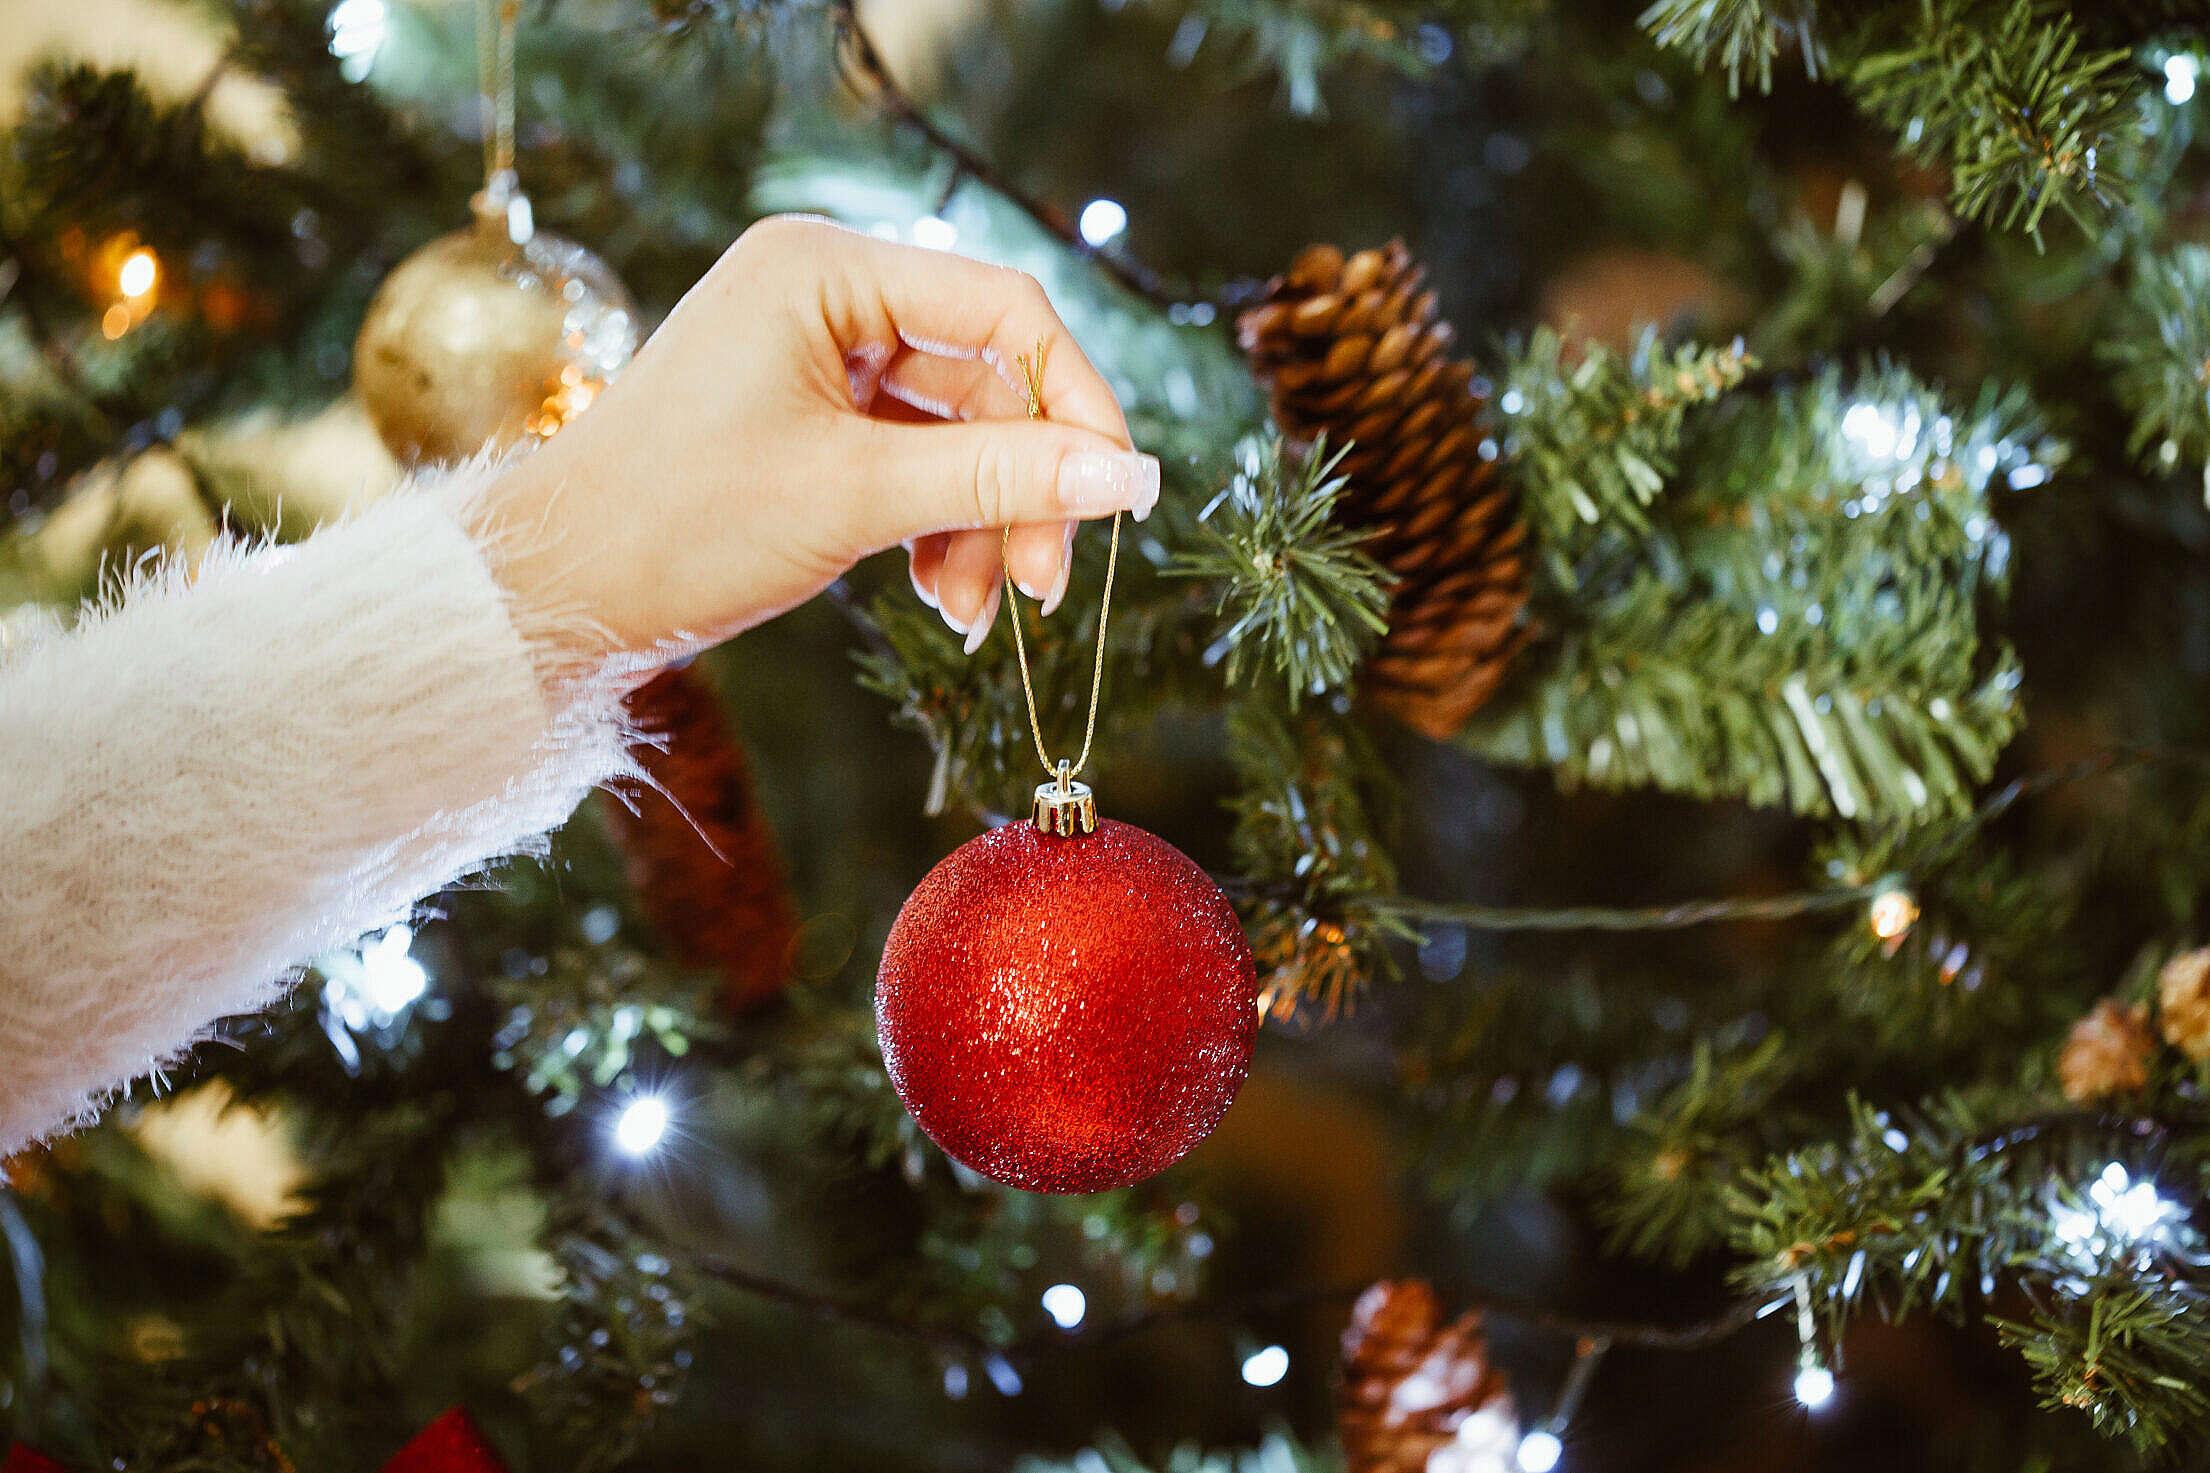 Decorating Christmas Tree Free Stock Photo